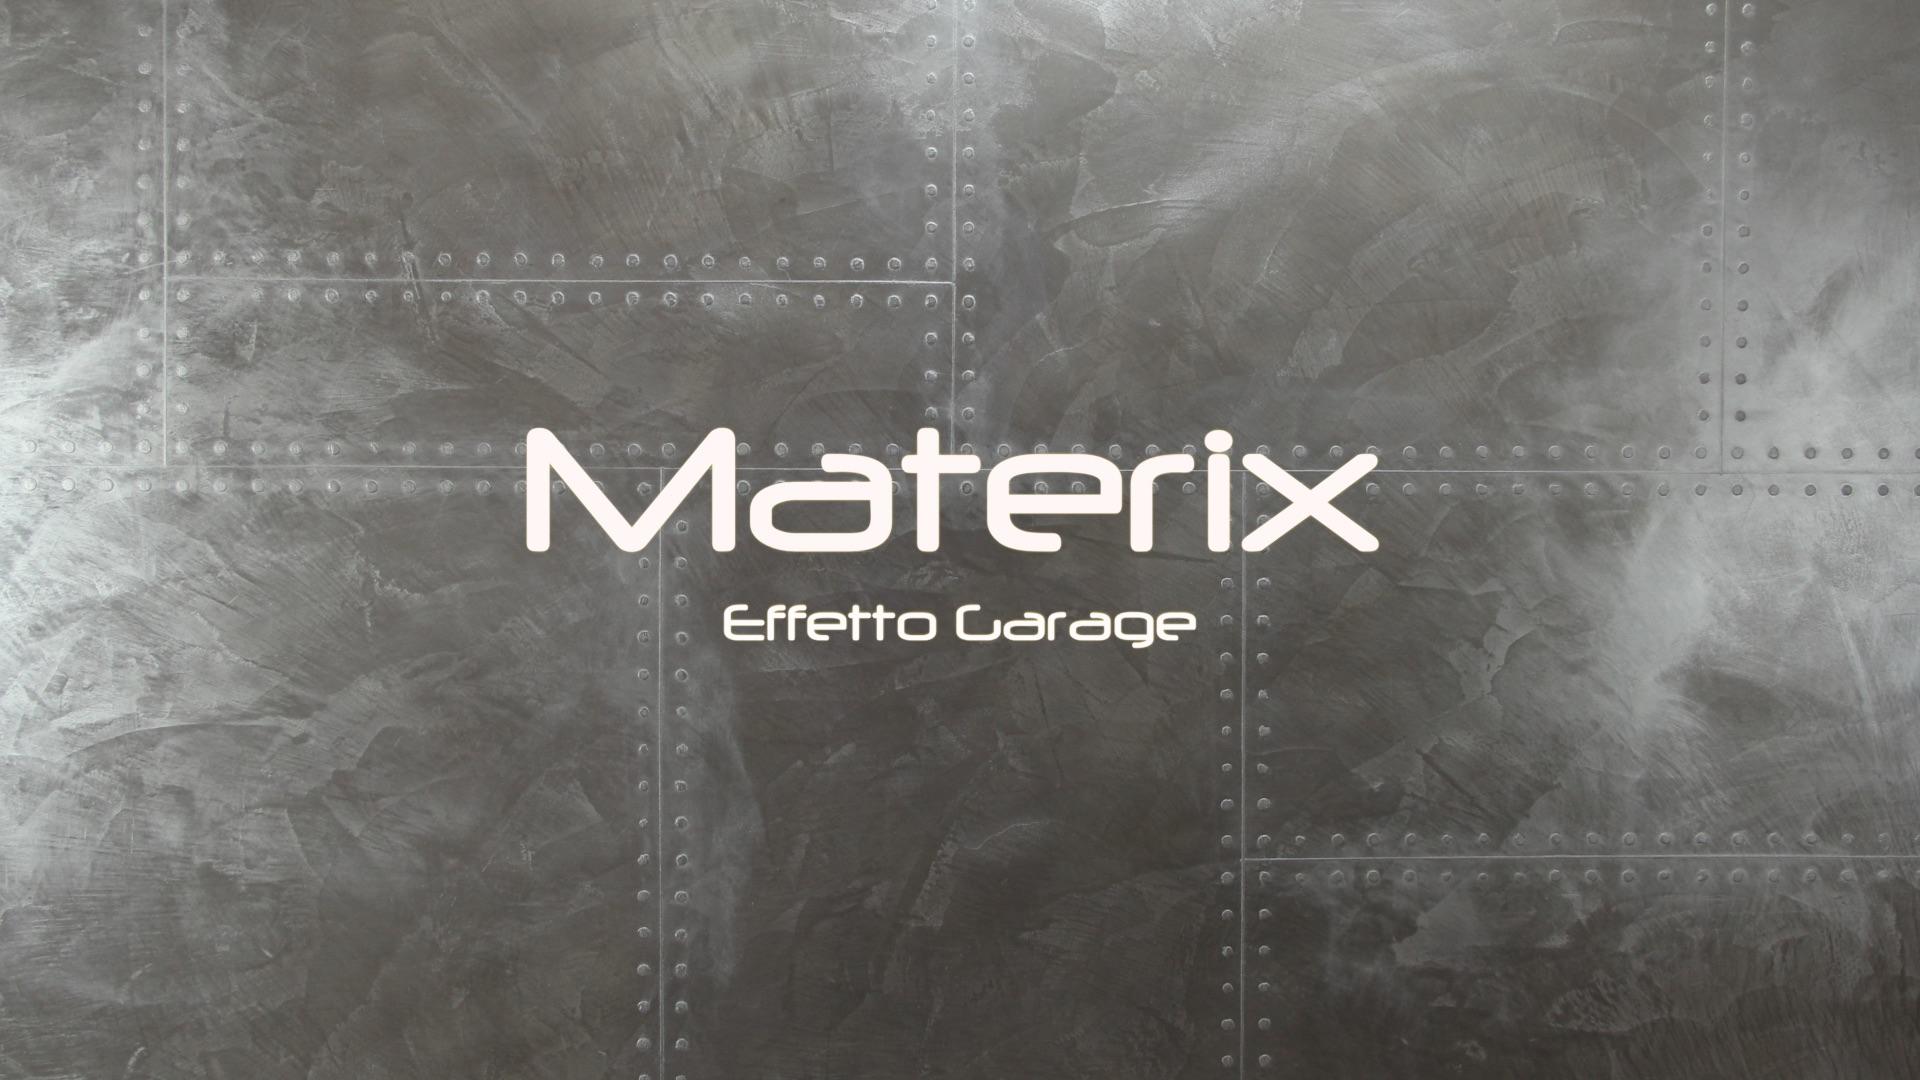 MaterixEffettoGarage